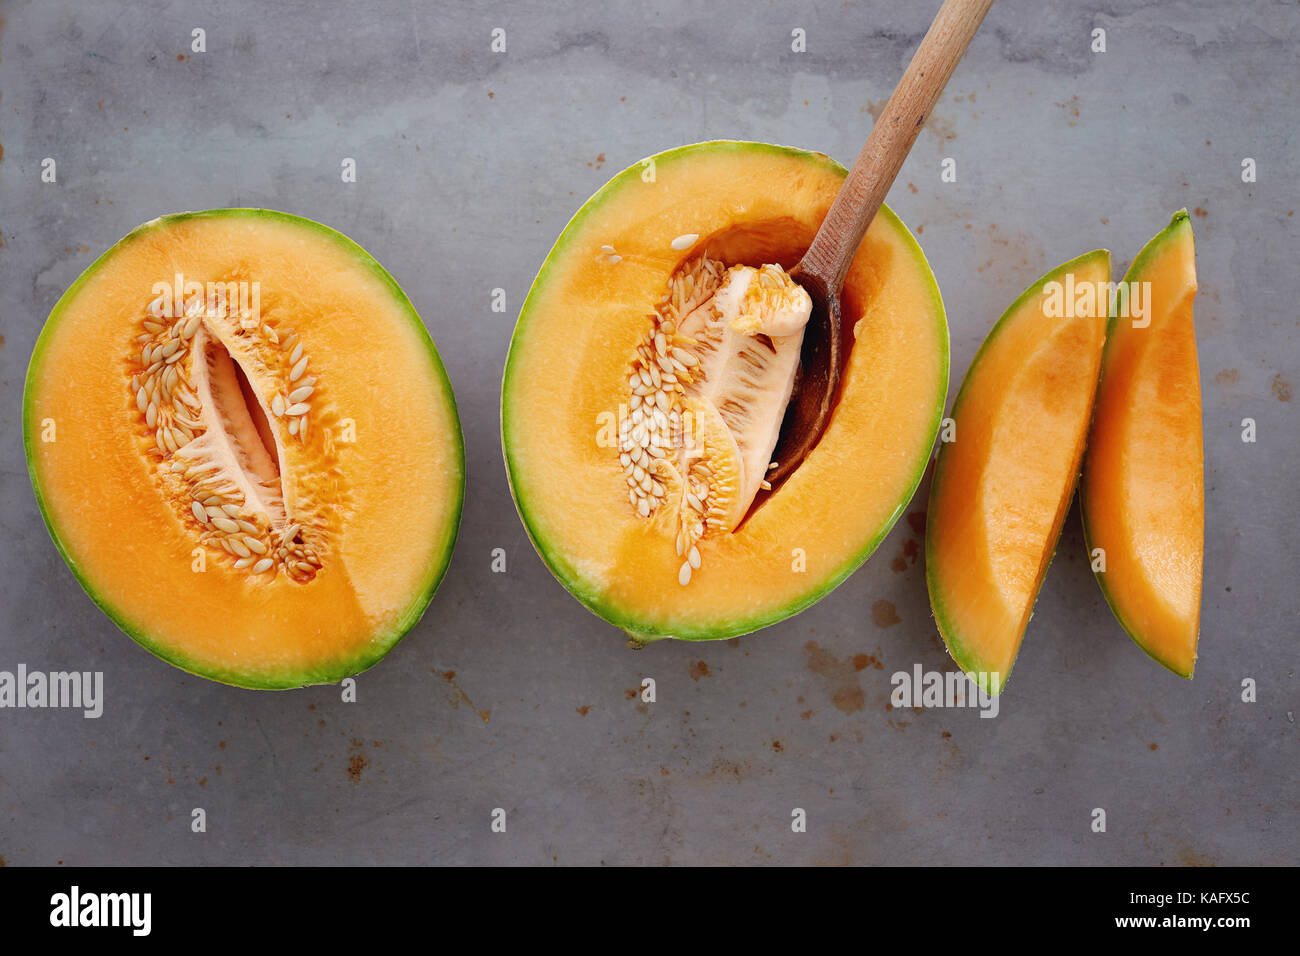 Fresh cantaloupe cut into pieces. Half cut of ripe cantaloupe melon with spoon. - Stock Image